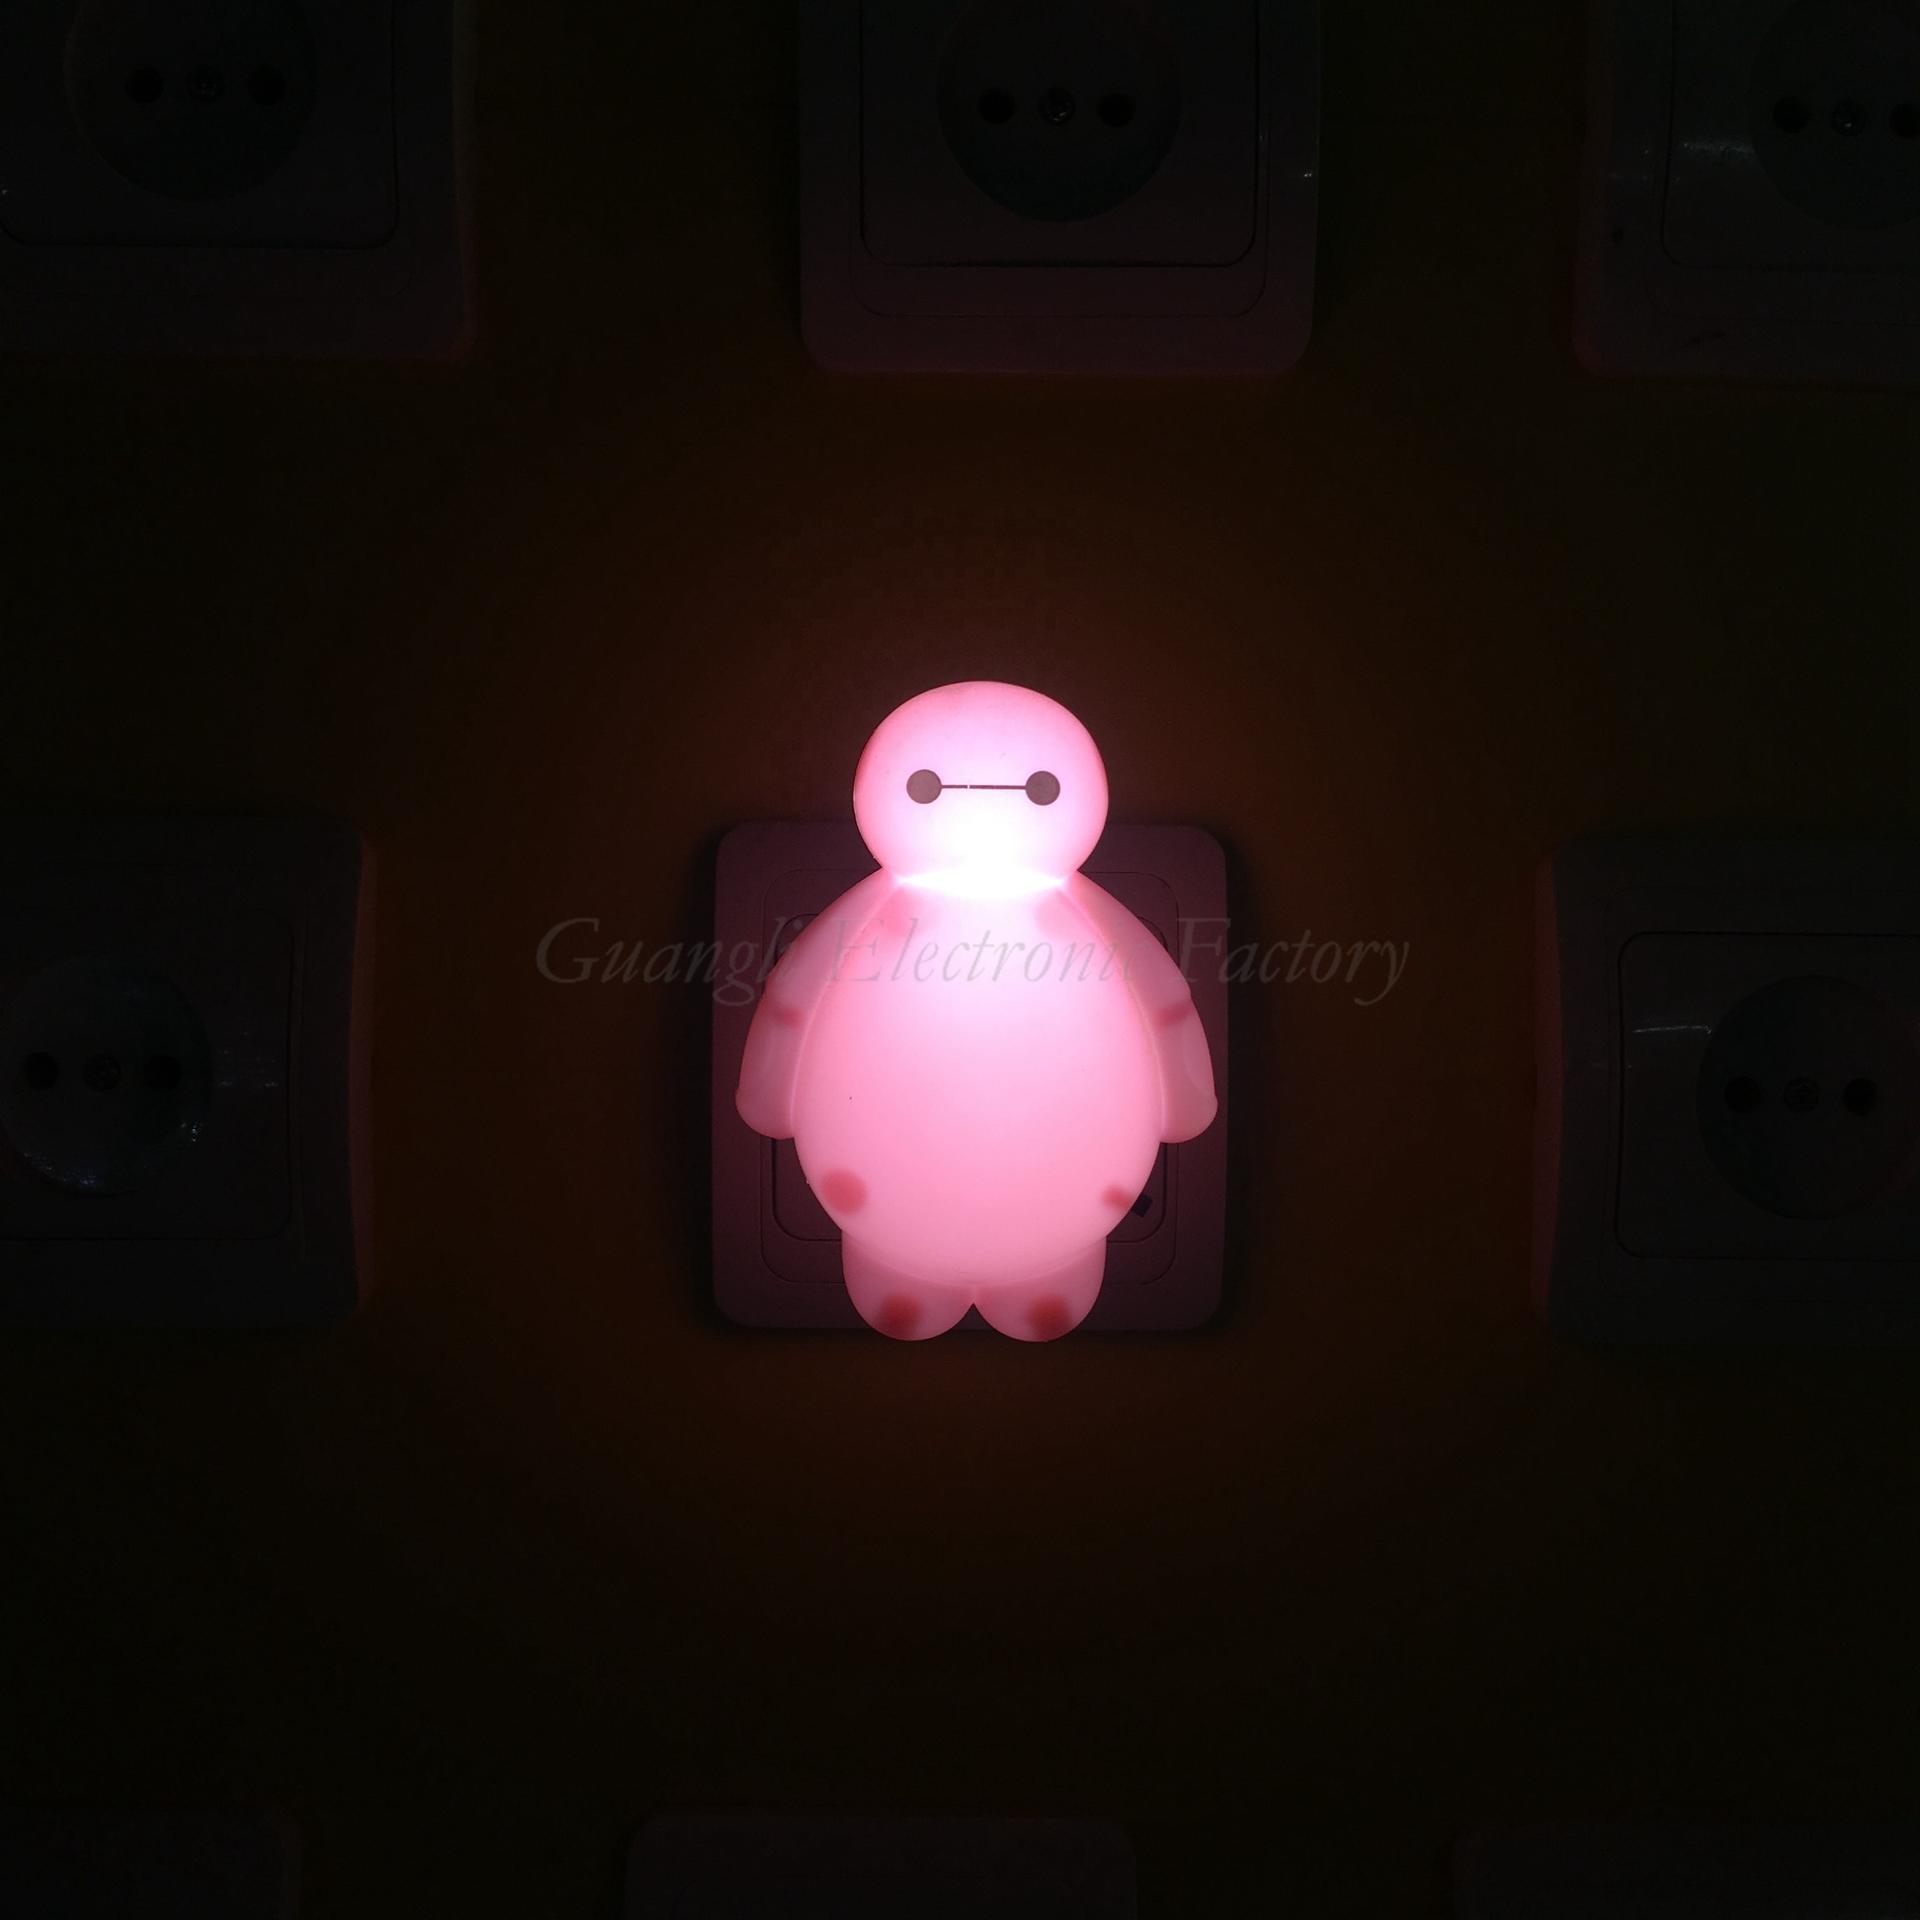 LED Night Light Lamp Creative Cartoon Style Baby sleep Lights decoration LAMP Nightlight EU and US Plug